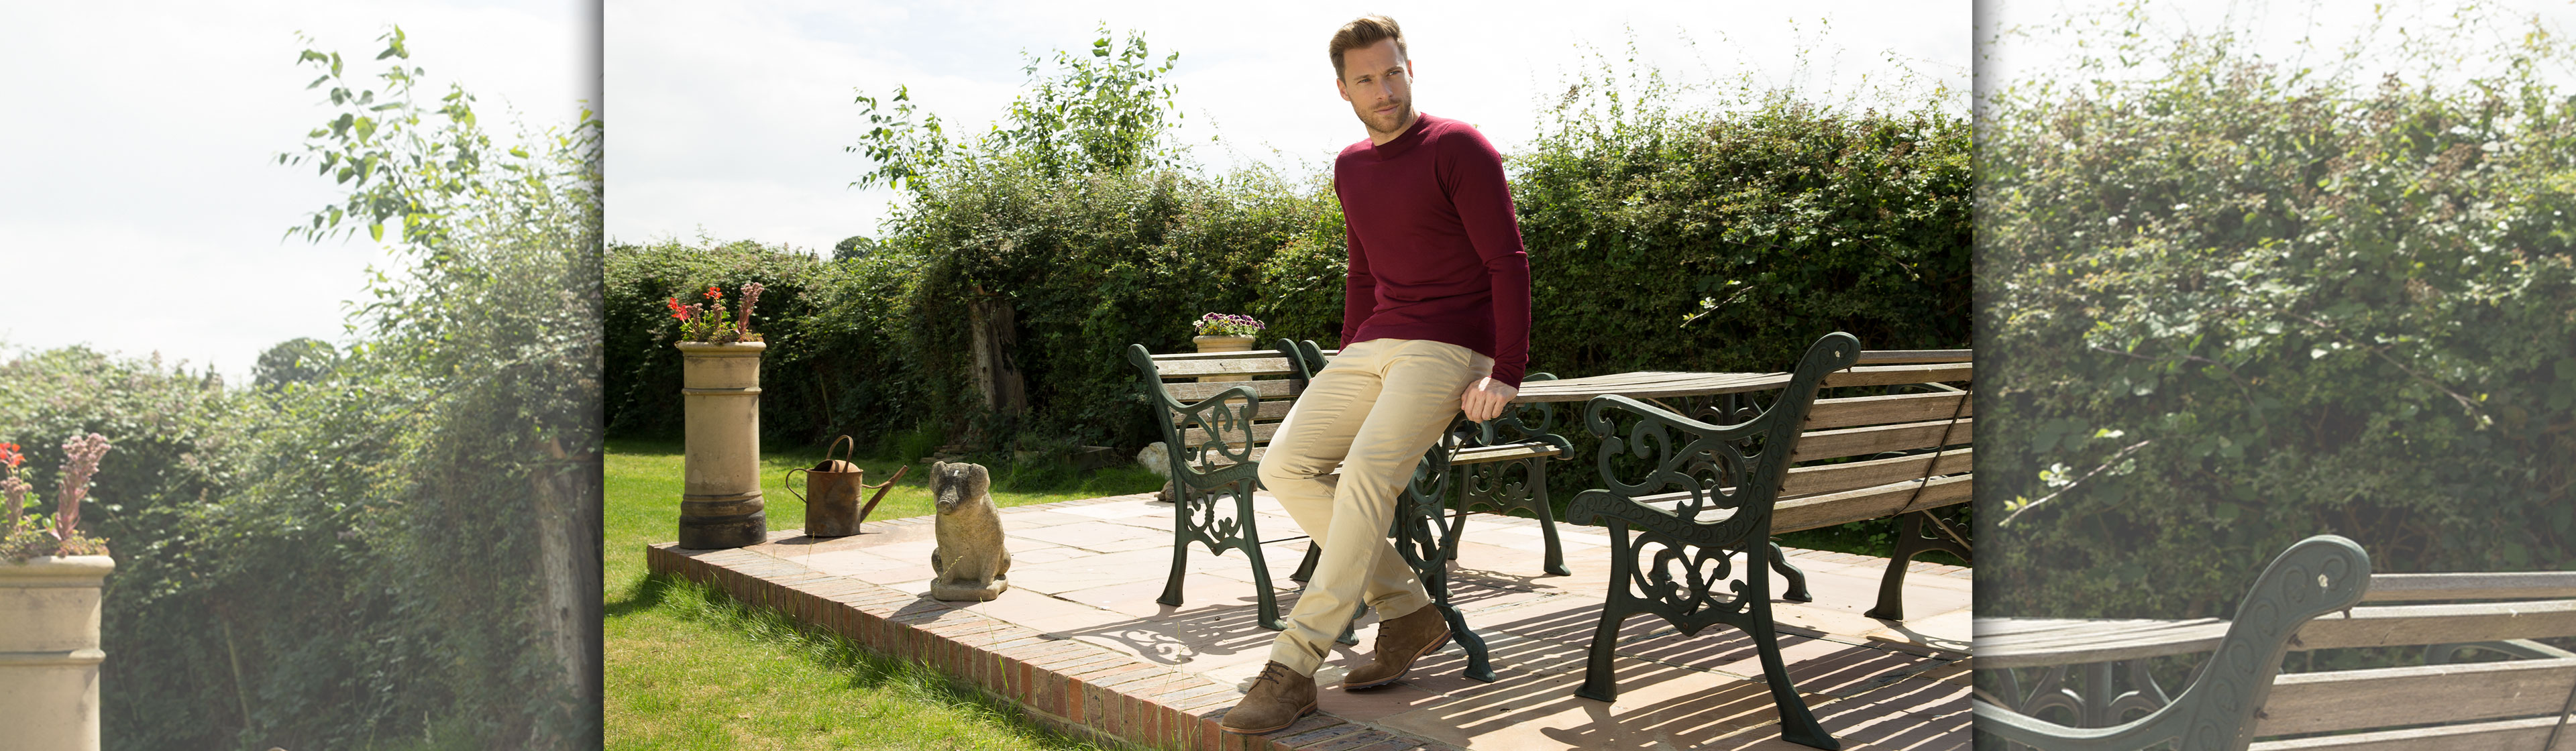 Brand Spotlight: John Smedley's World Famous Knitwear